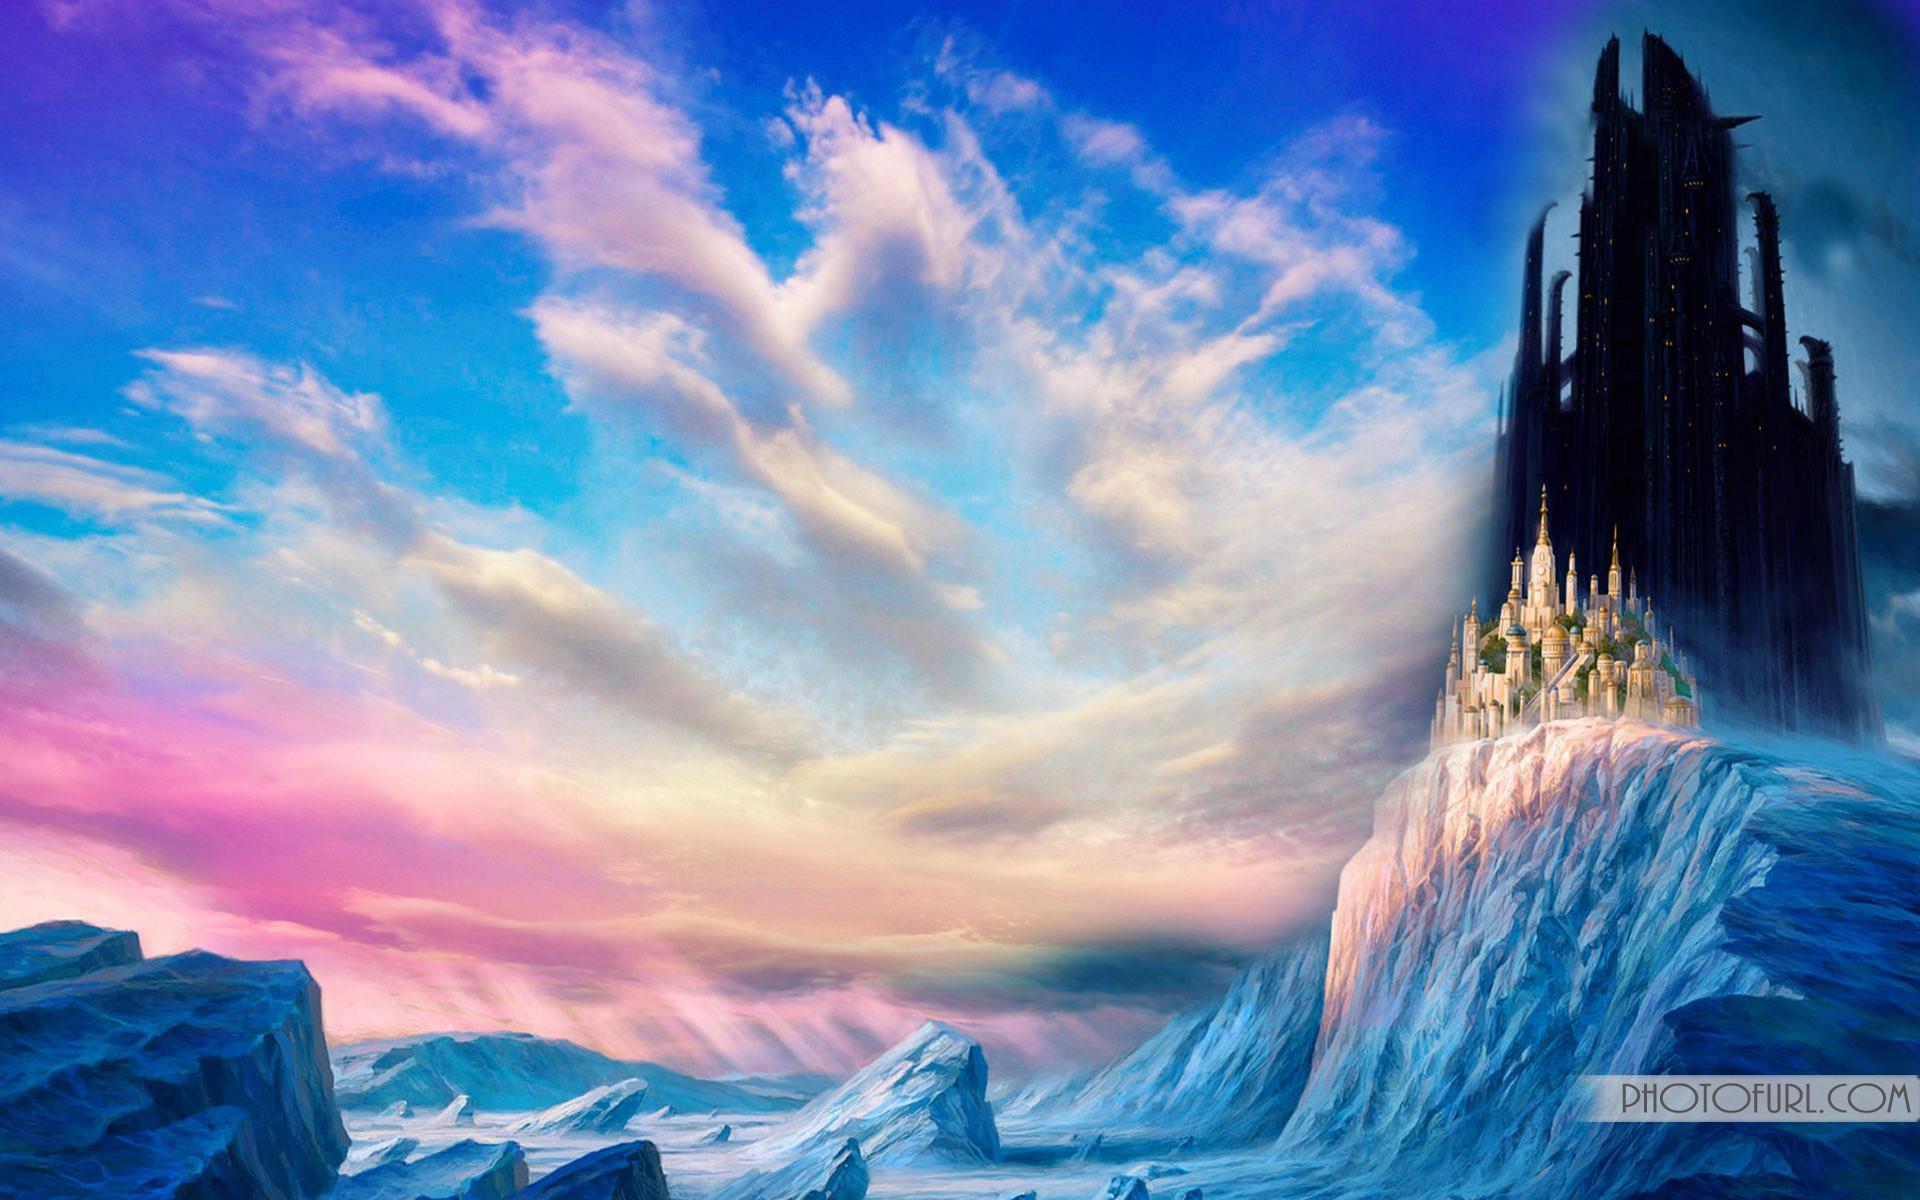 Beautiful 3d wallpaper wallpapertag - 3d animation pictures desktop ...